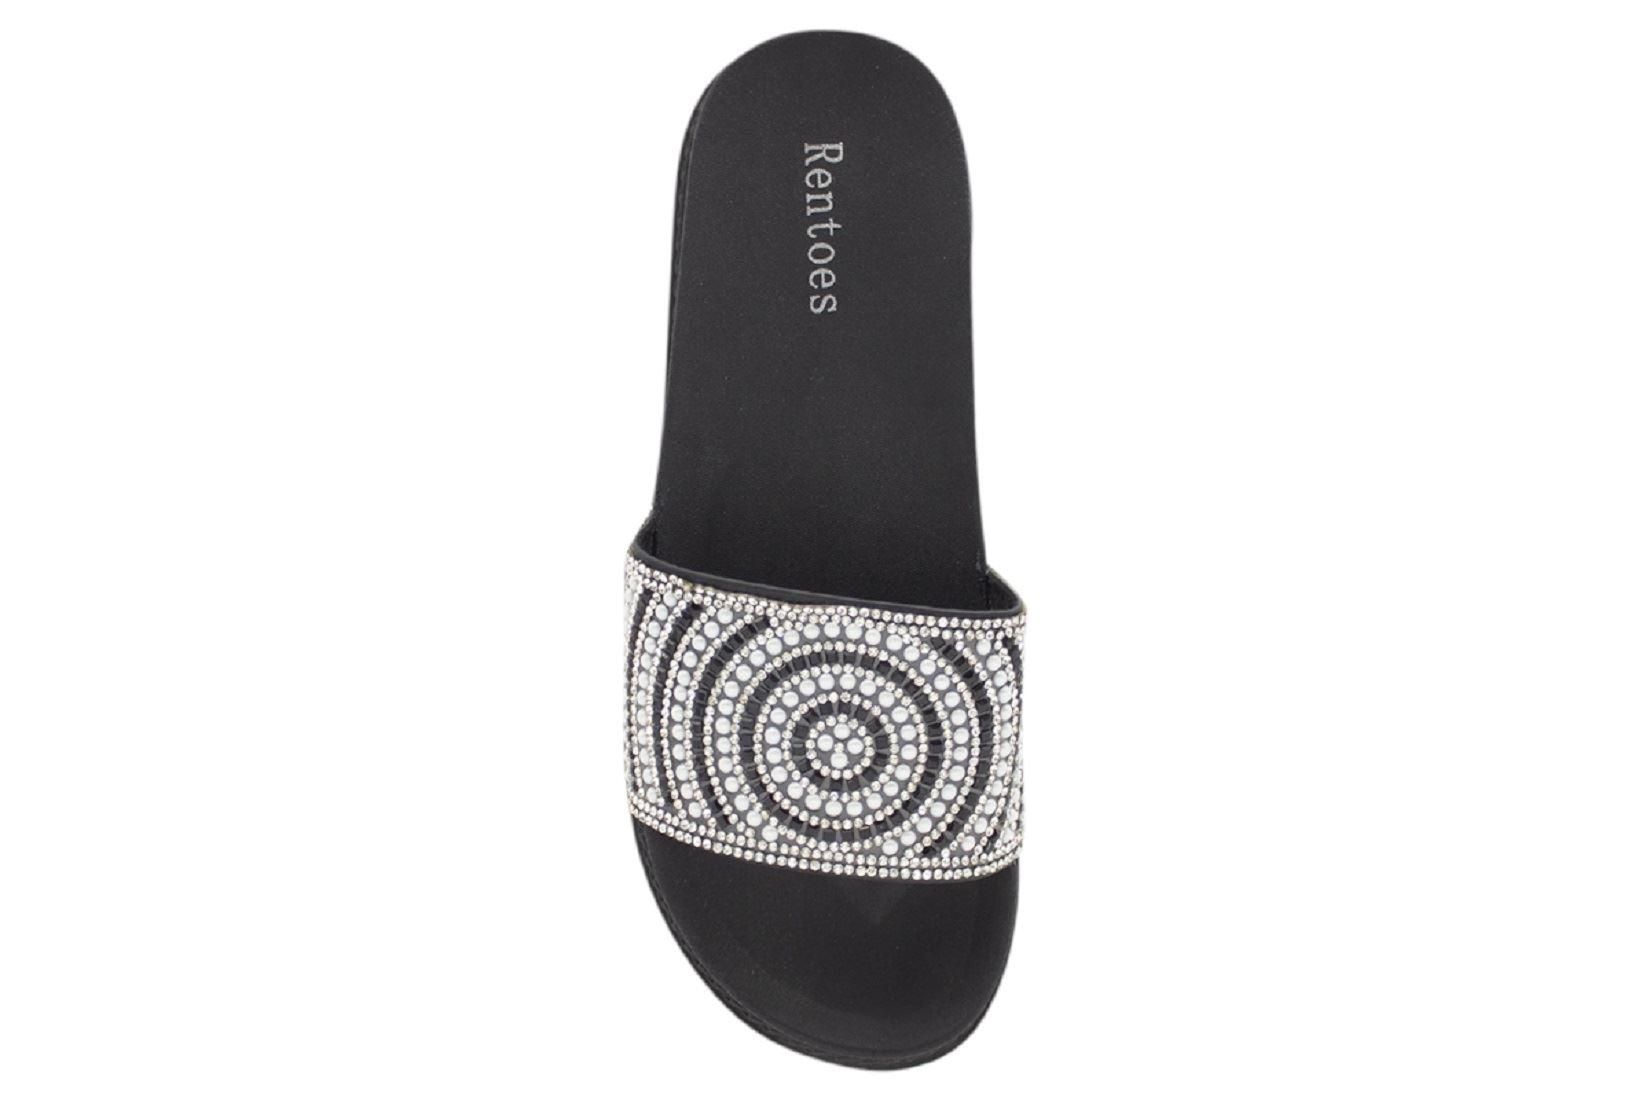 Womens-Sliders-Casual-Slippers-Mules-Ladies-Diamante-Flip-Flop-Sandals-Shoes thumbnail 19